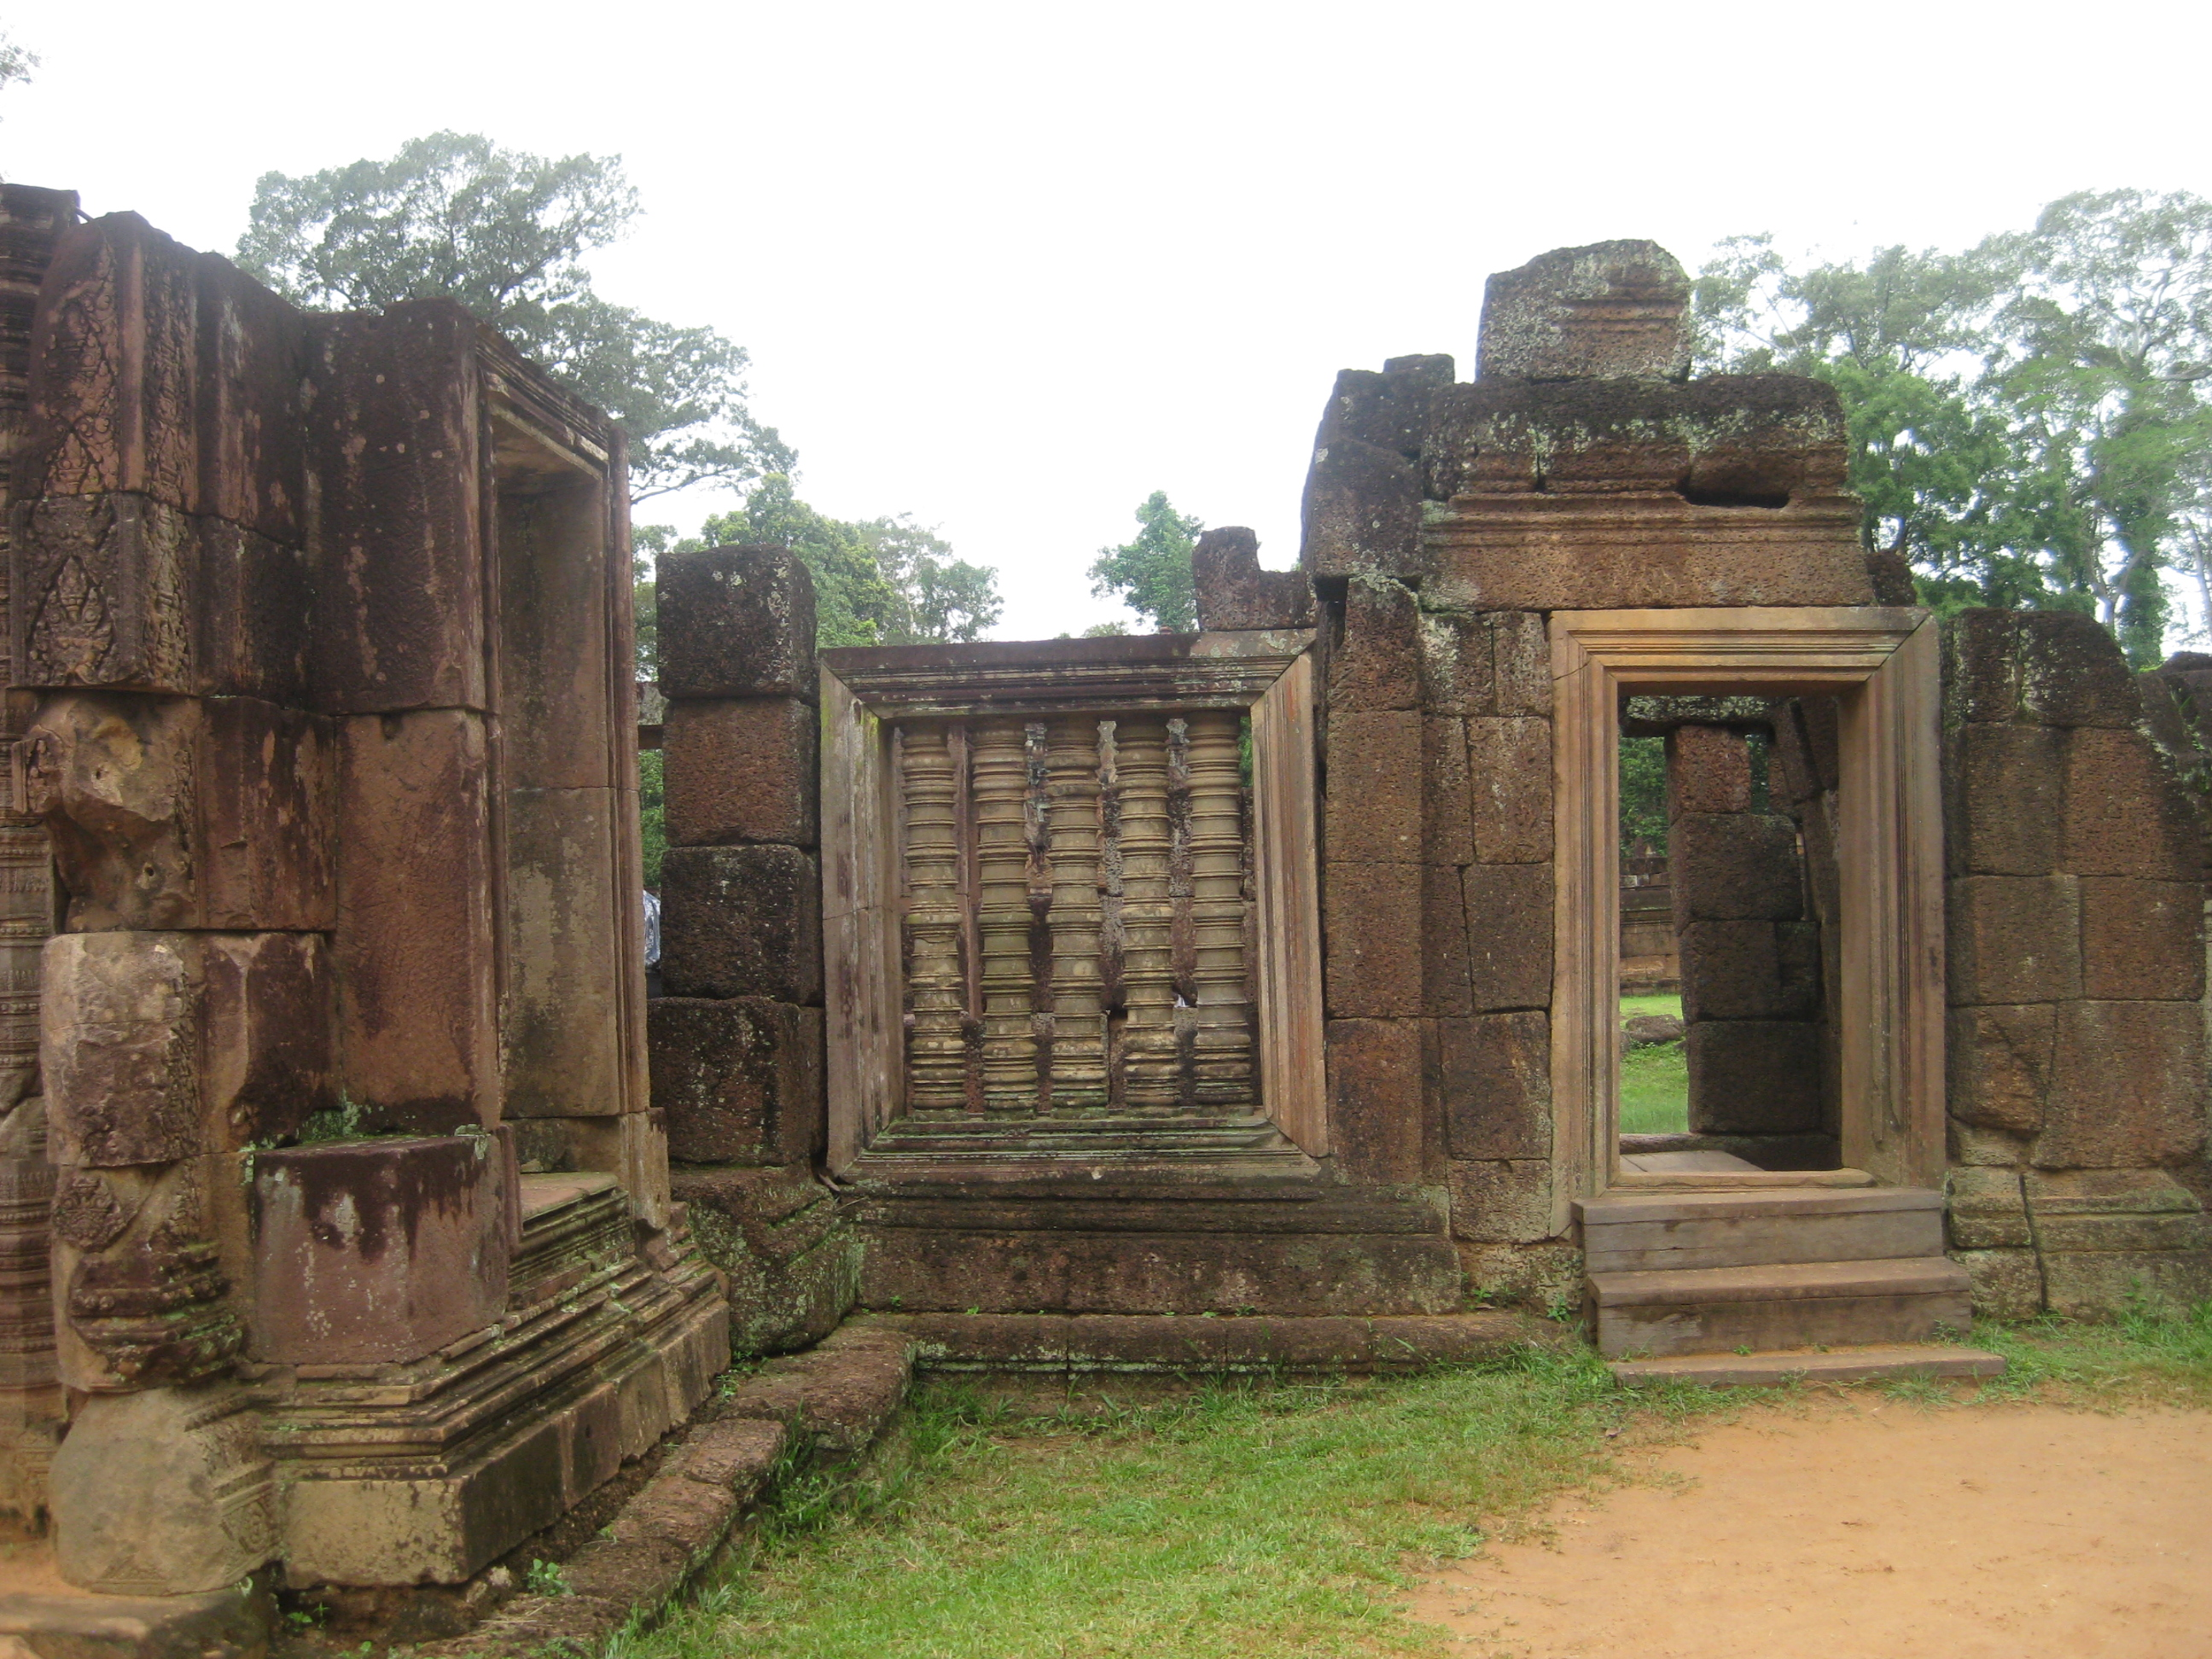 Siem Reap, Banteay Srey Temple